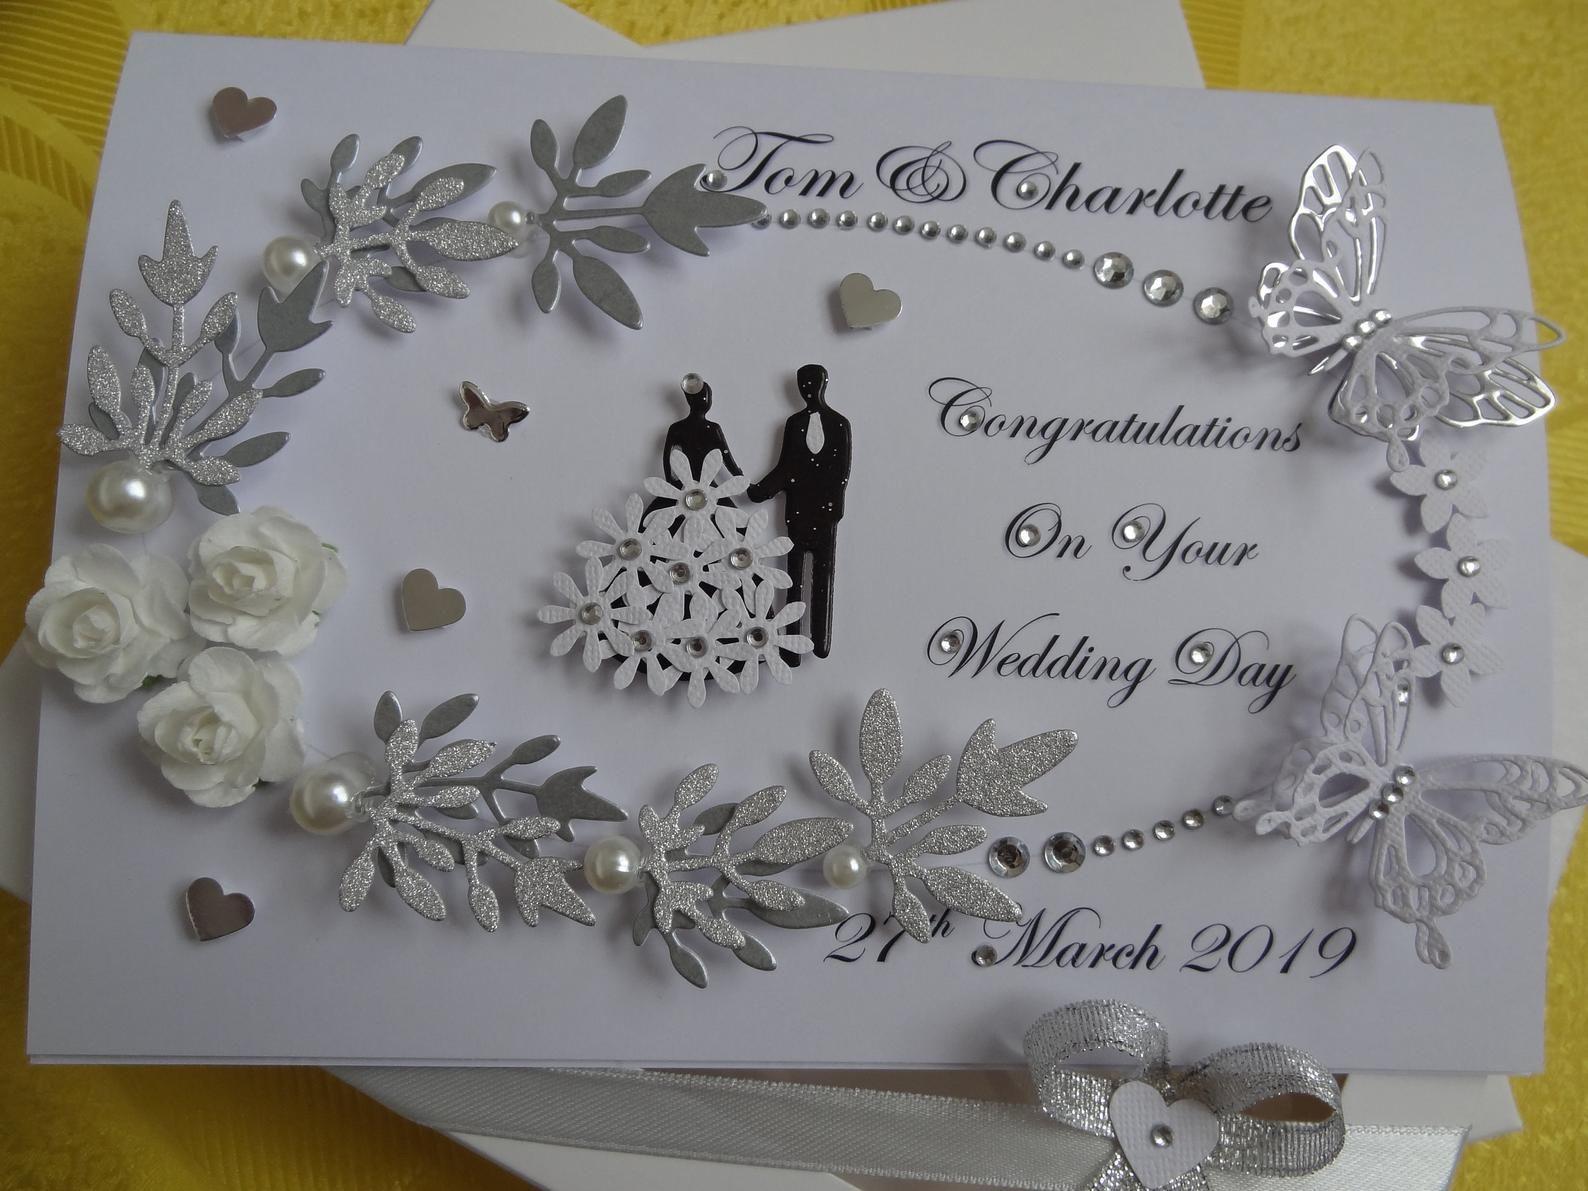 Personalised Luxury Handmade Wedding Card Anniversary Card With Gift Box Wedding Cards Handmade Anniversary Cards Handmade Card Making